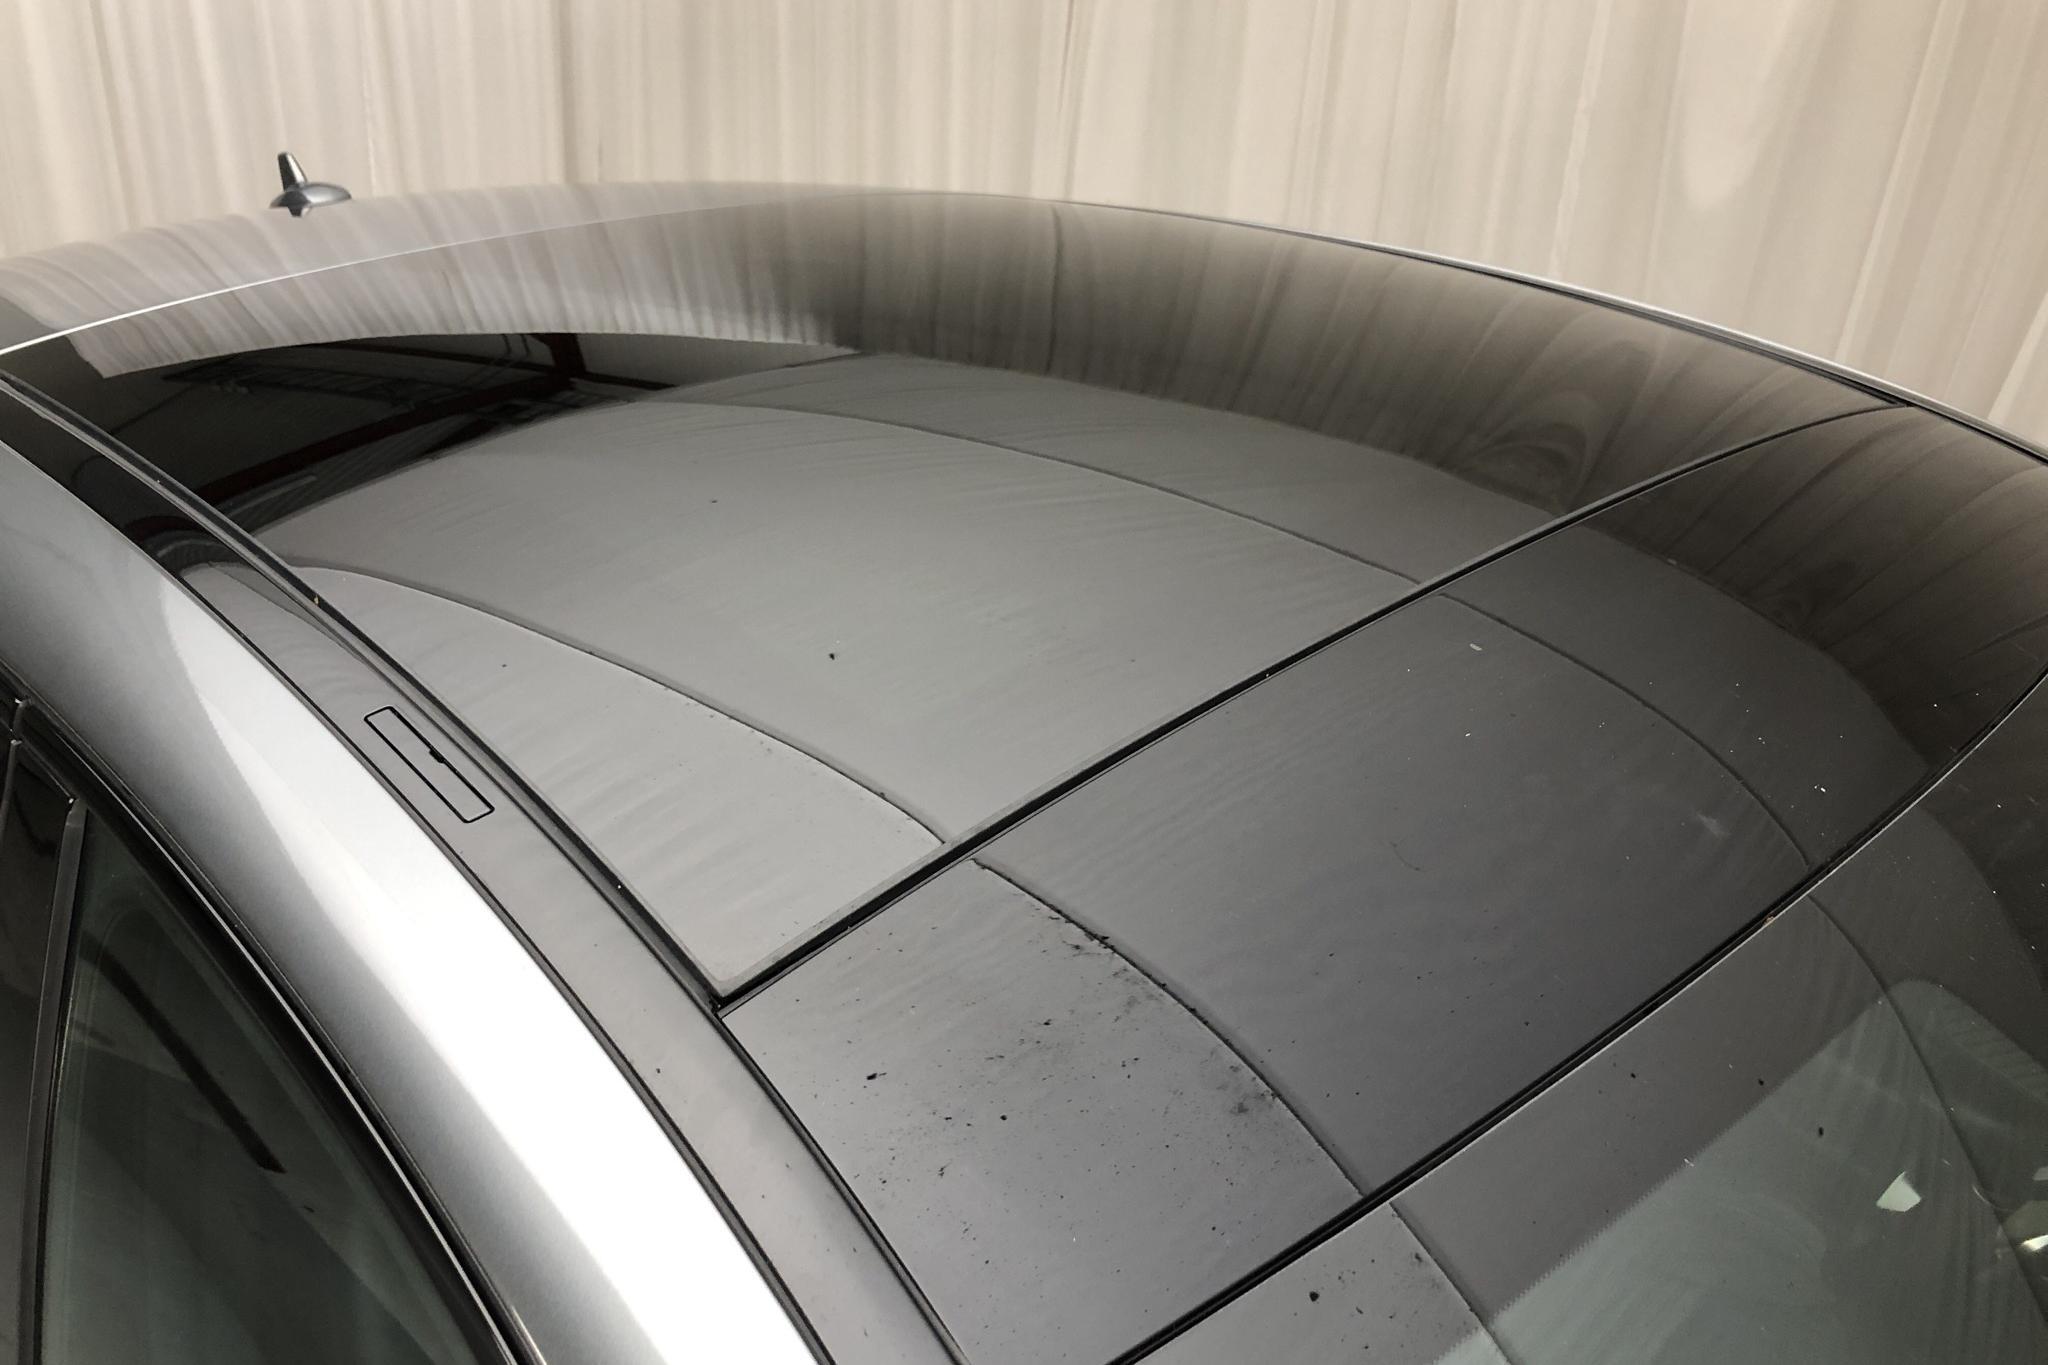 Mercedes GLE 43 AMG 4MATIC Coupé C292 (390hk) - 150 880 km - Automatic - gray - 2019